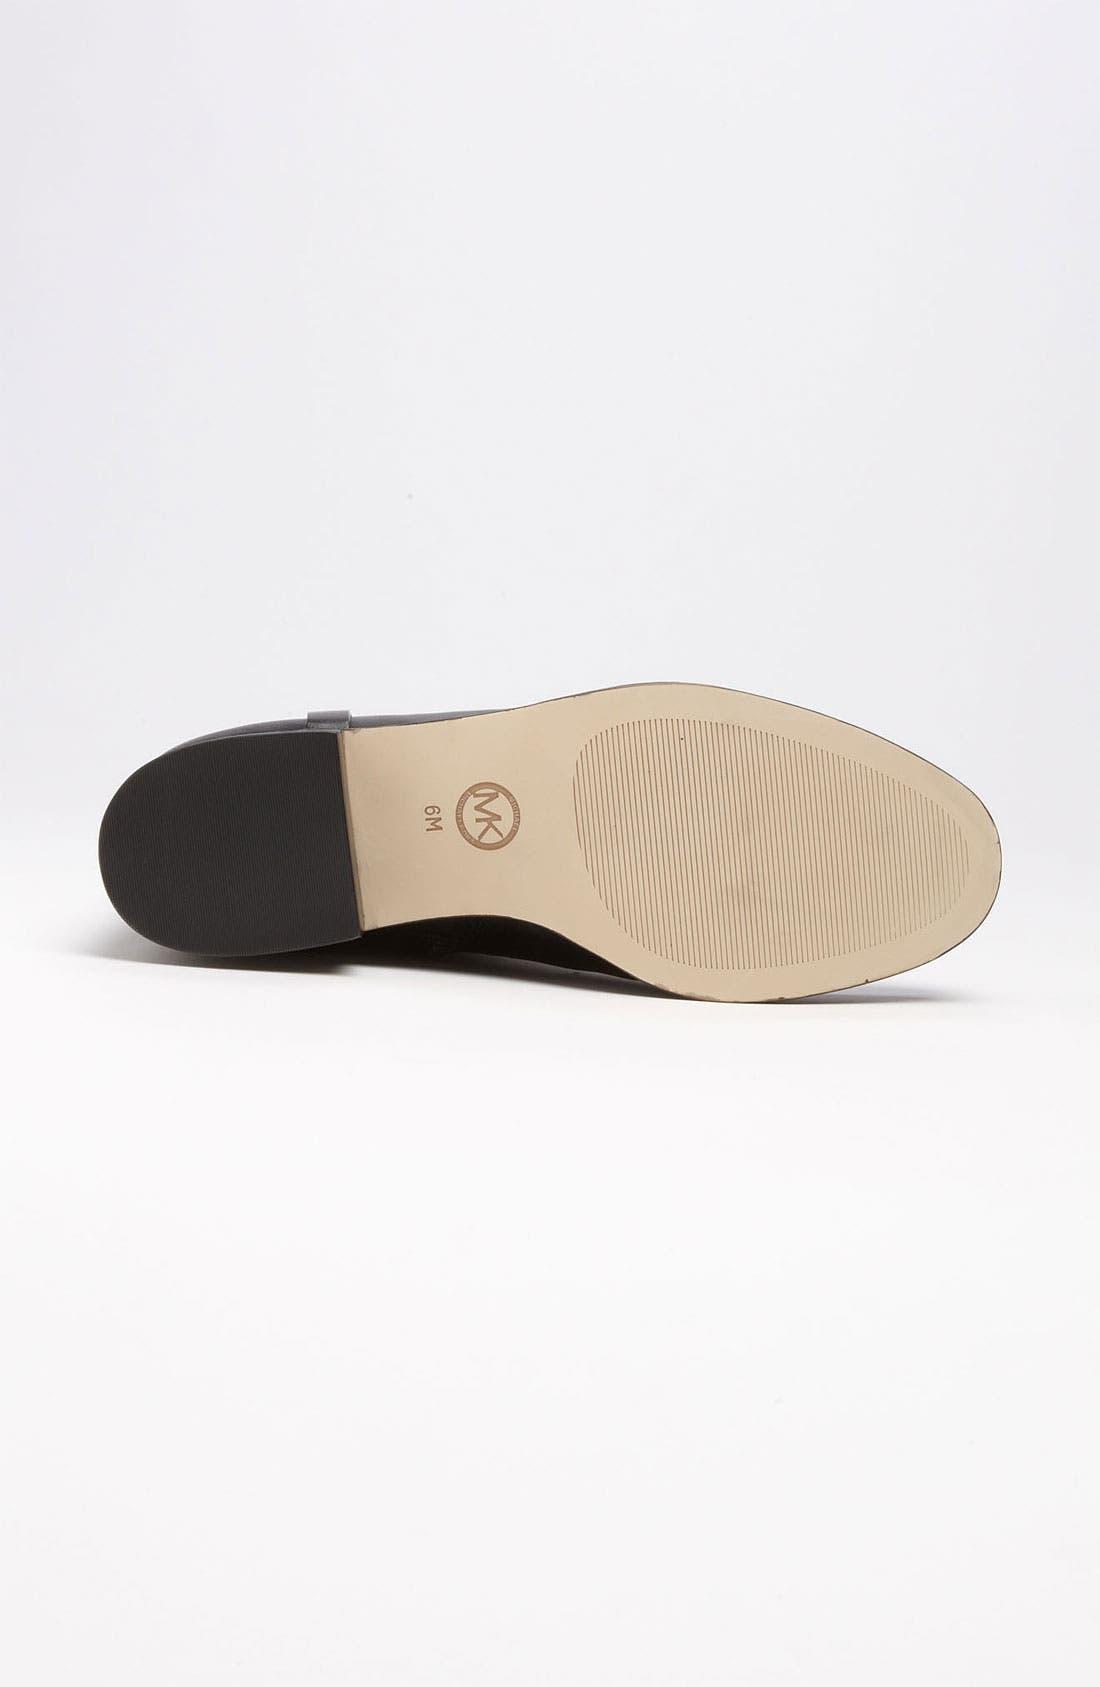 MICHAEL MICHAEL KORS,                             'Fulton' Harness Boot,                             Alternate thumbnail 3, color,                             014